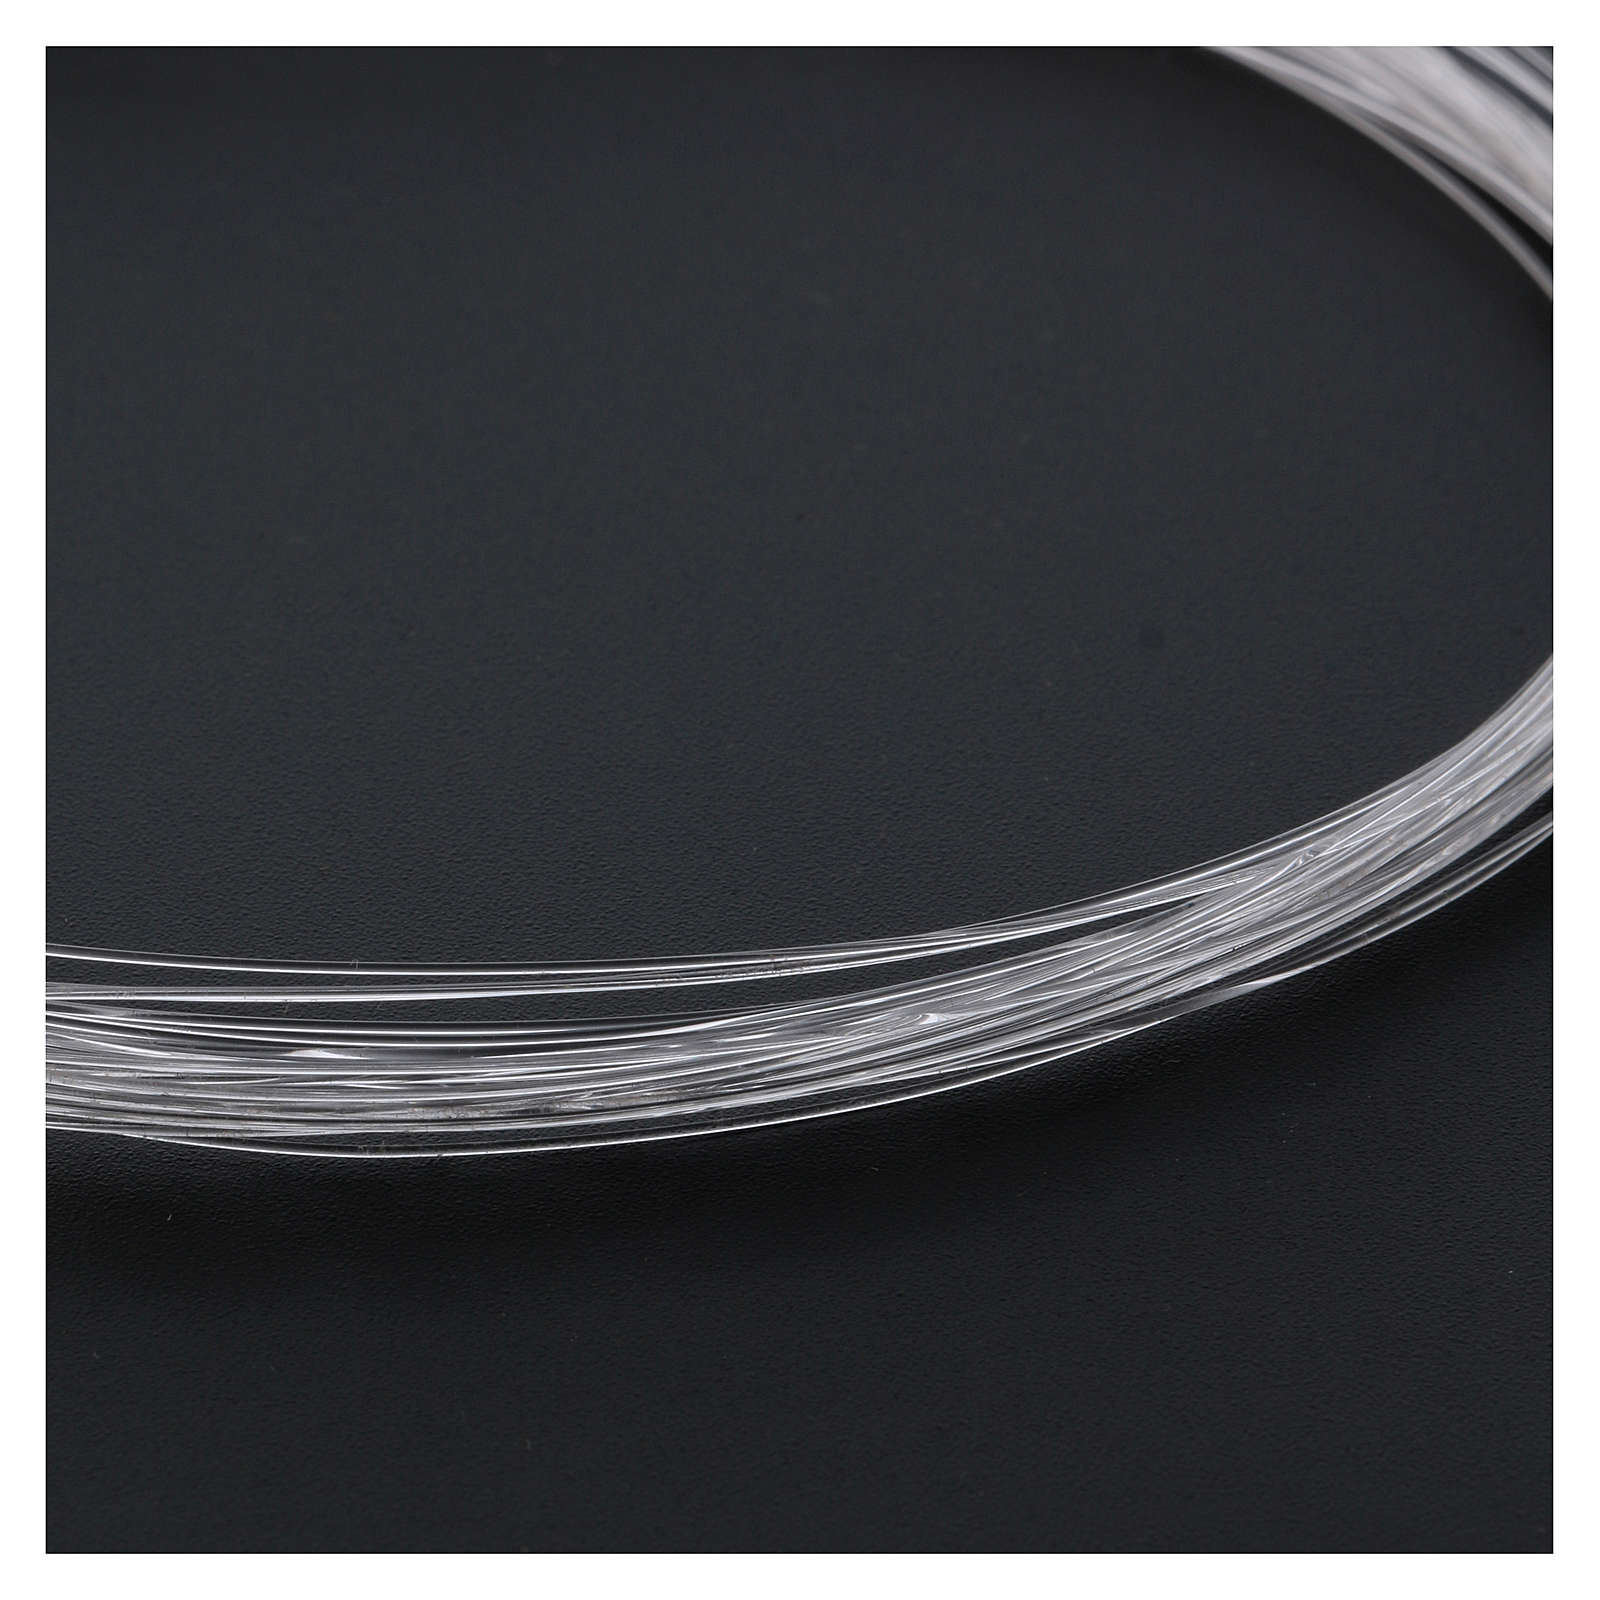 Bobine de fibre optique 10m pour crèche - diam. 0,50 mm 4